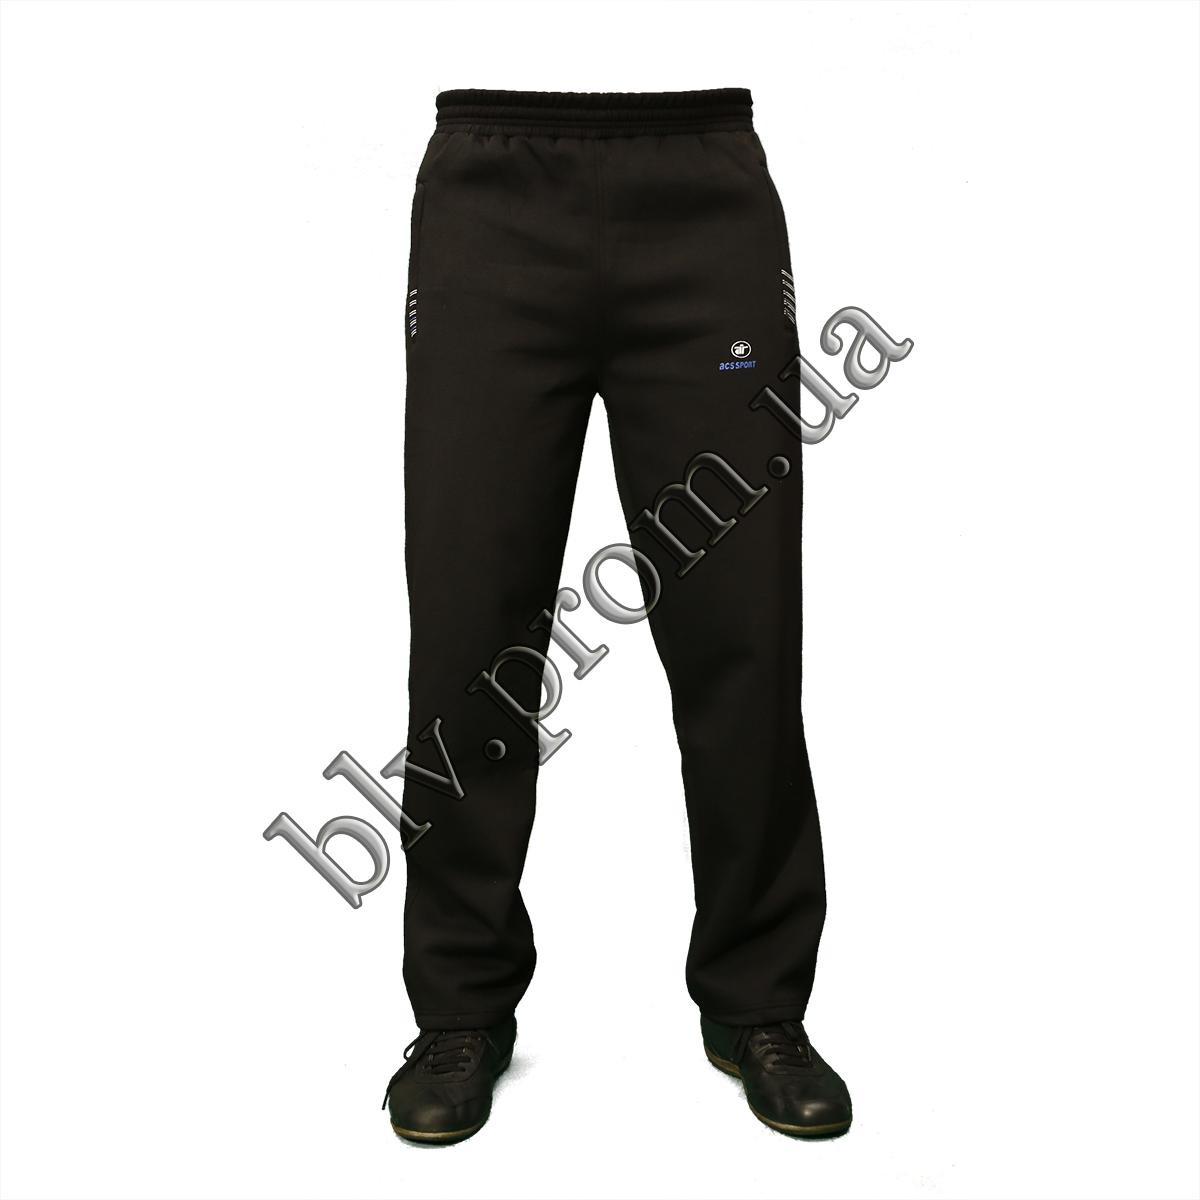 Теплые мужские брюки байка пр-во Турция KD884 Black